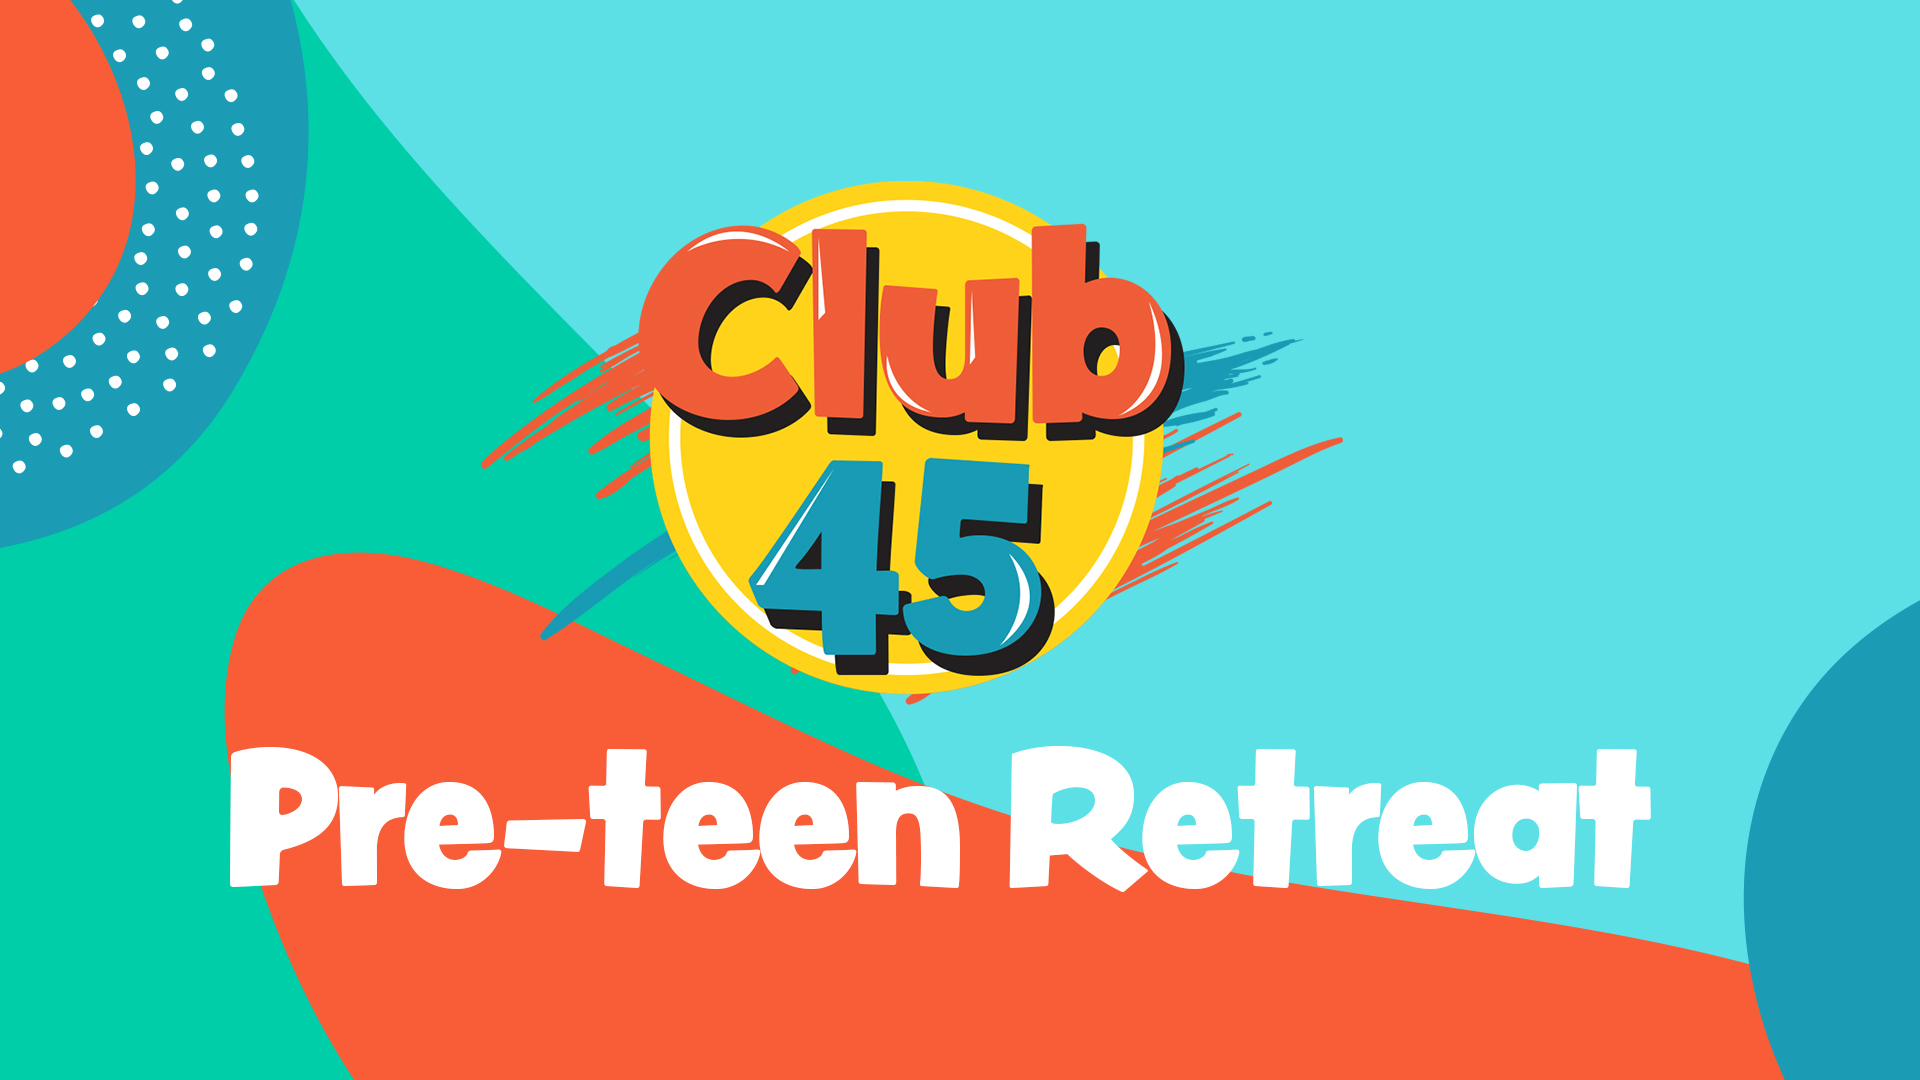 Pre-Teen Retreat